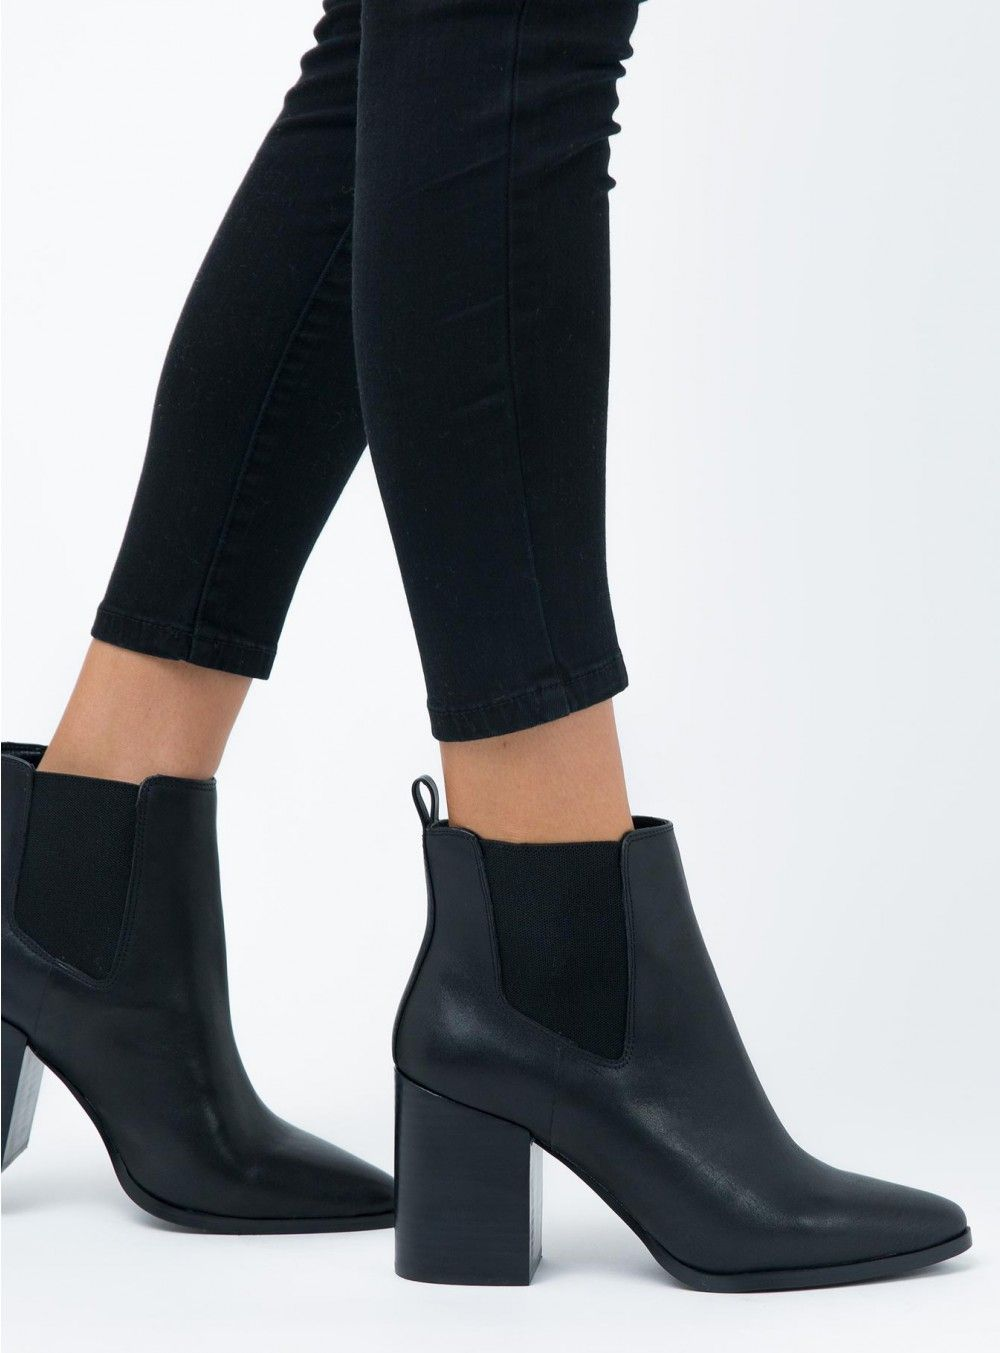 86f15c20110 Windsor Smith Fran Boots Black